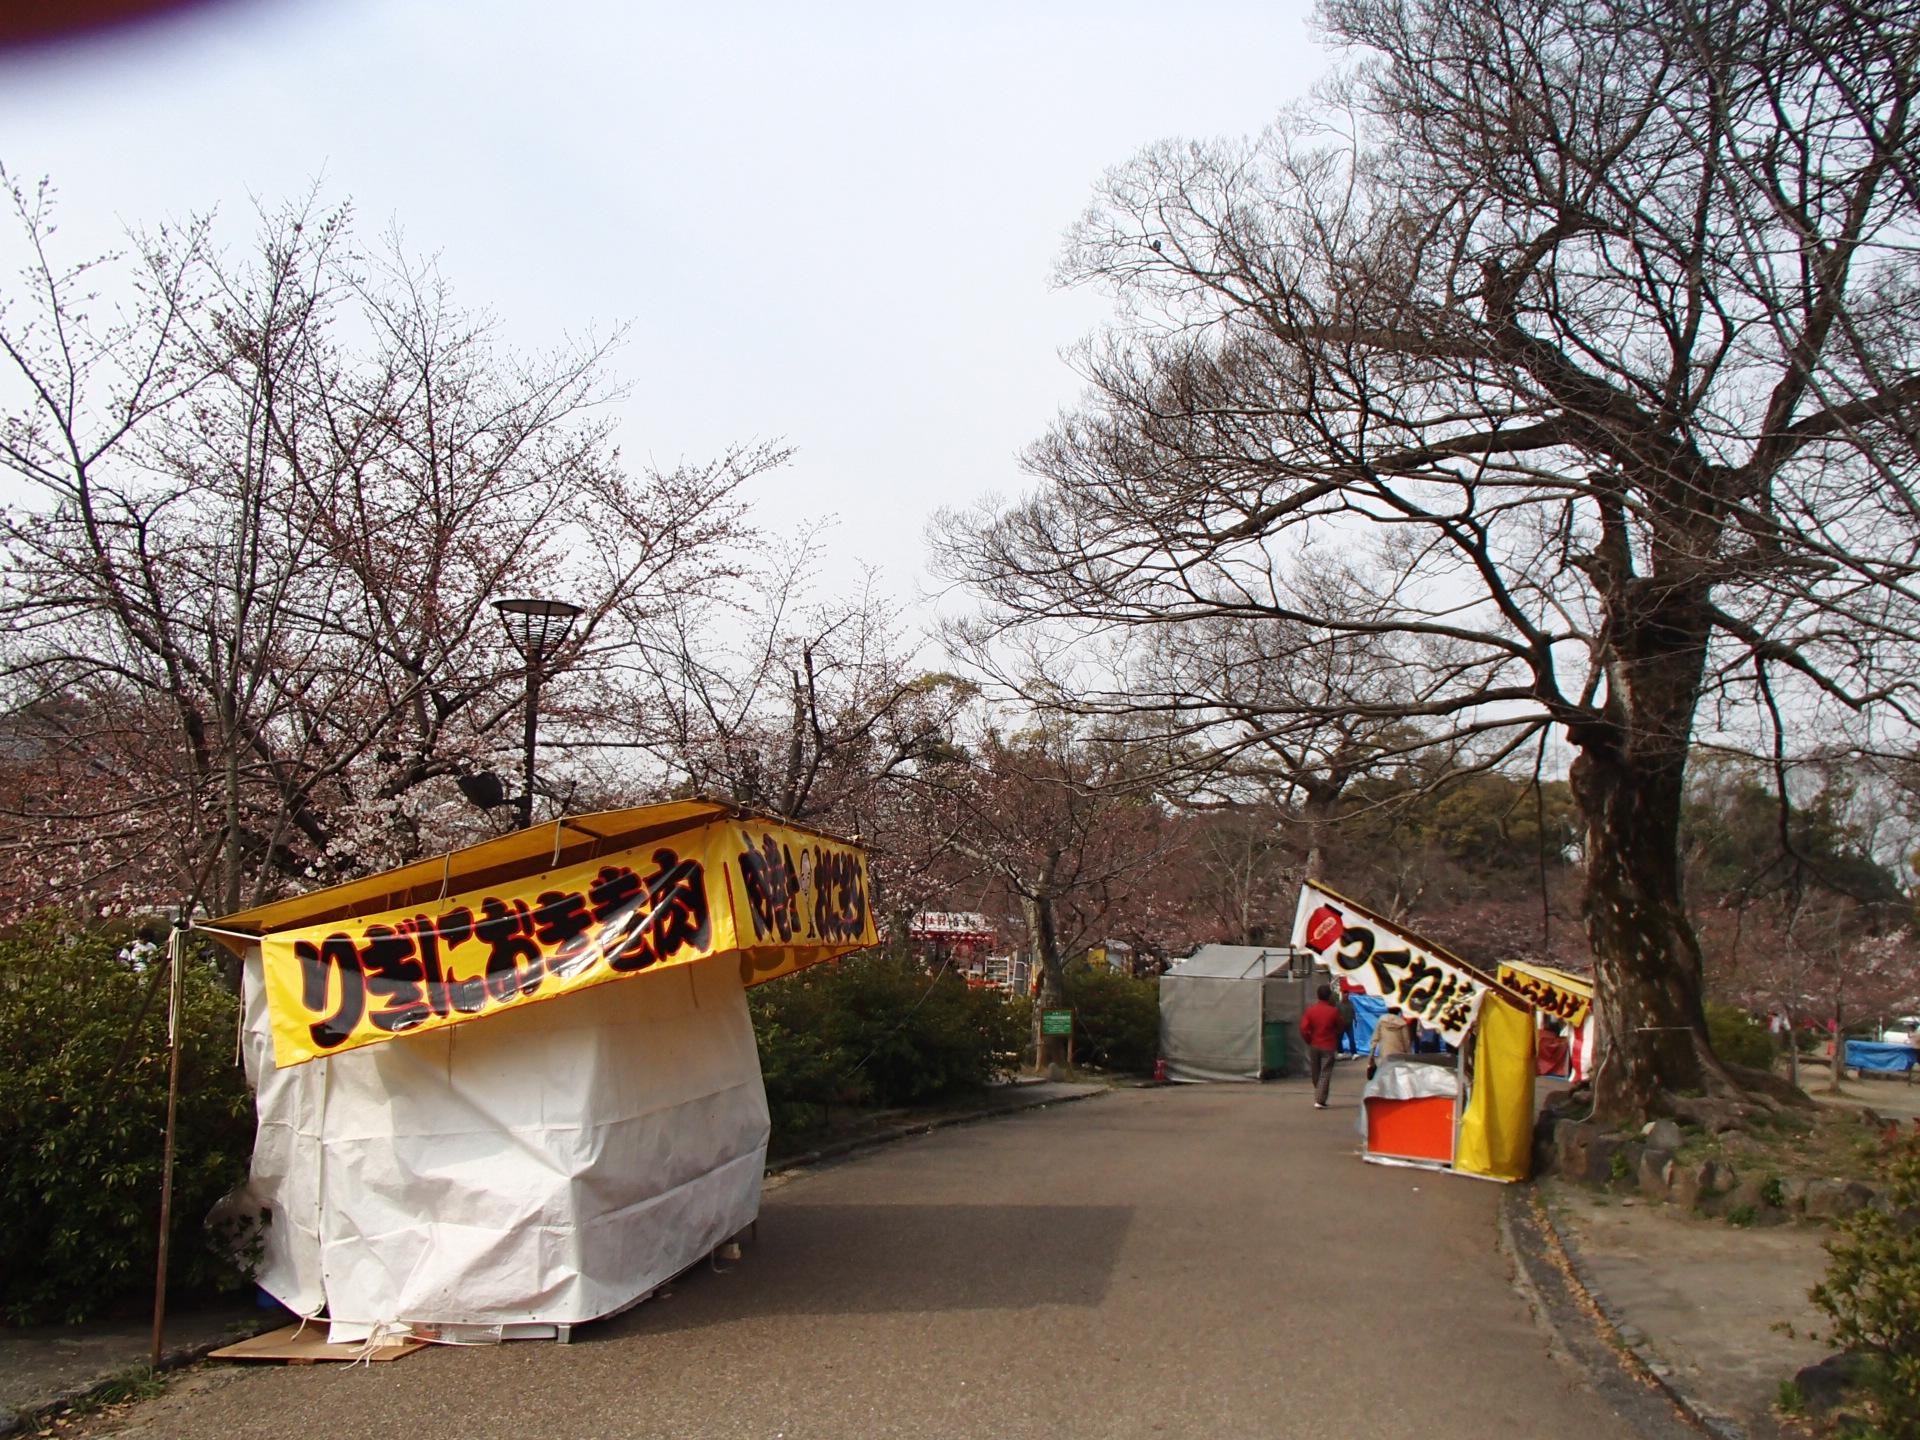 http://www.kyoto-ga.jp/event/thumb/kyokai/P3303257.JPG